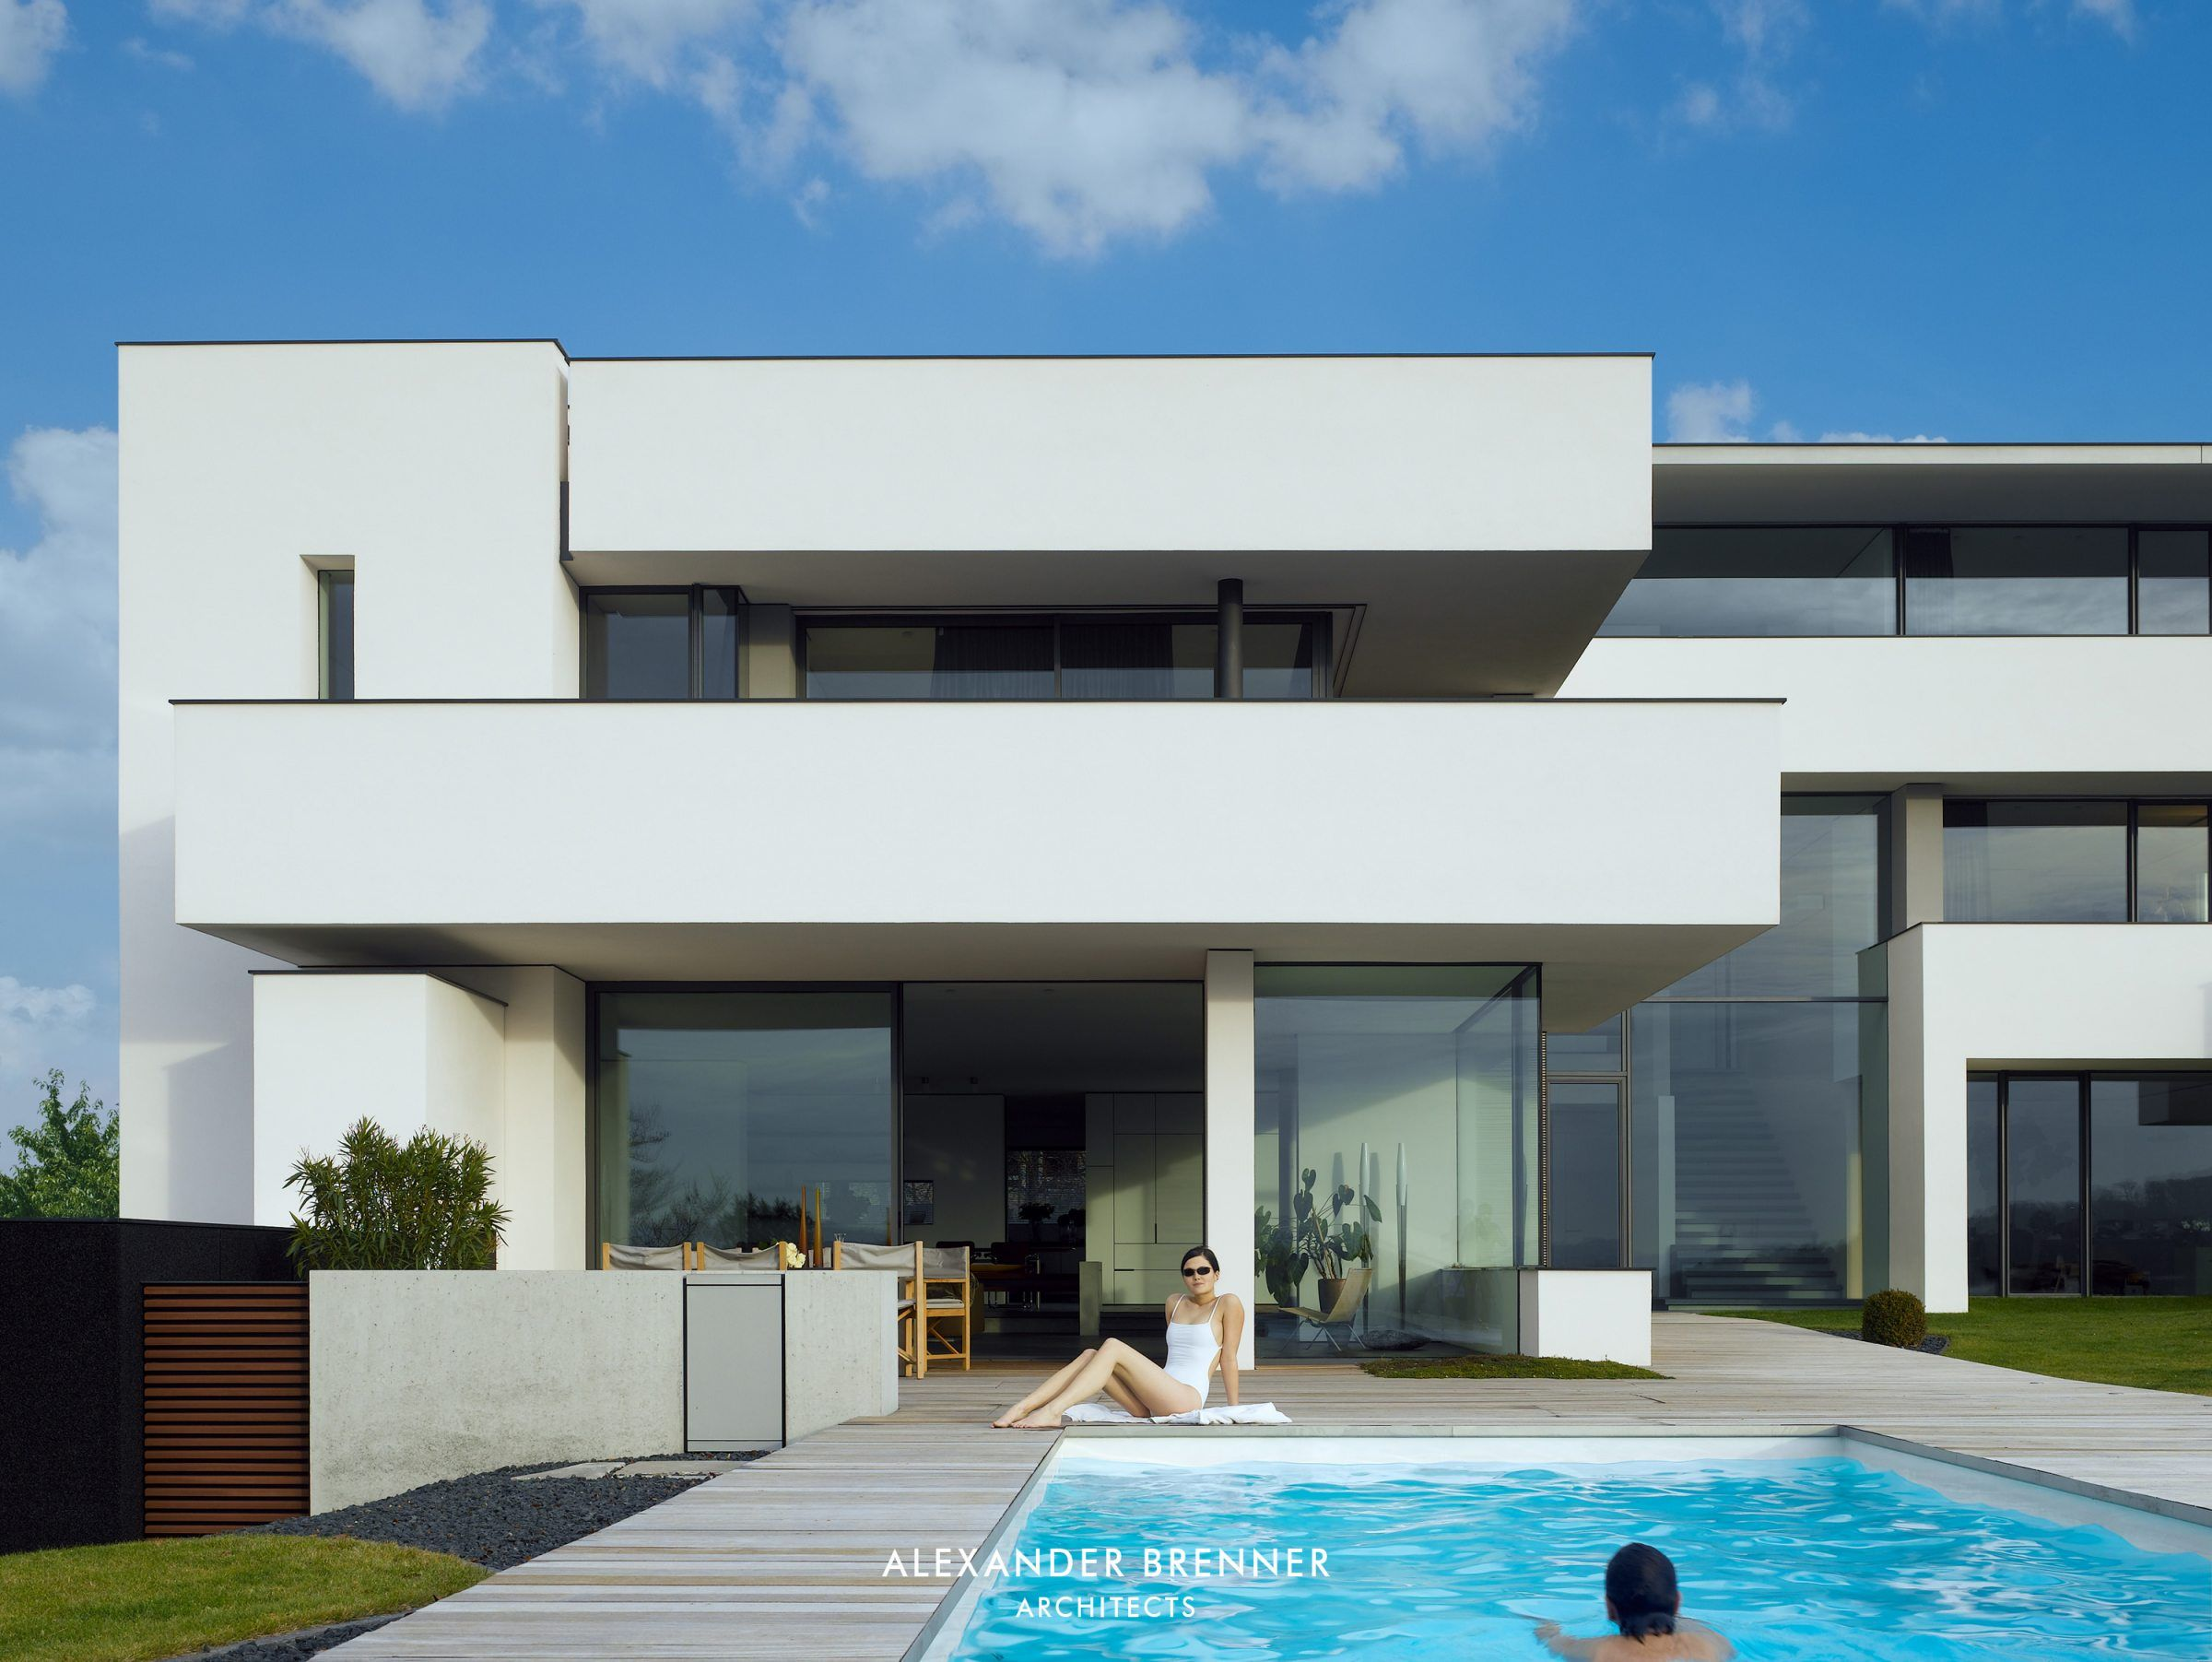 Am Oberen Berg - Alexander Brenner Architects   Architecture ...